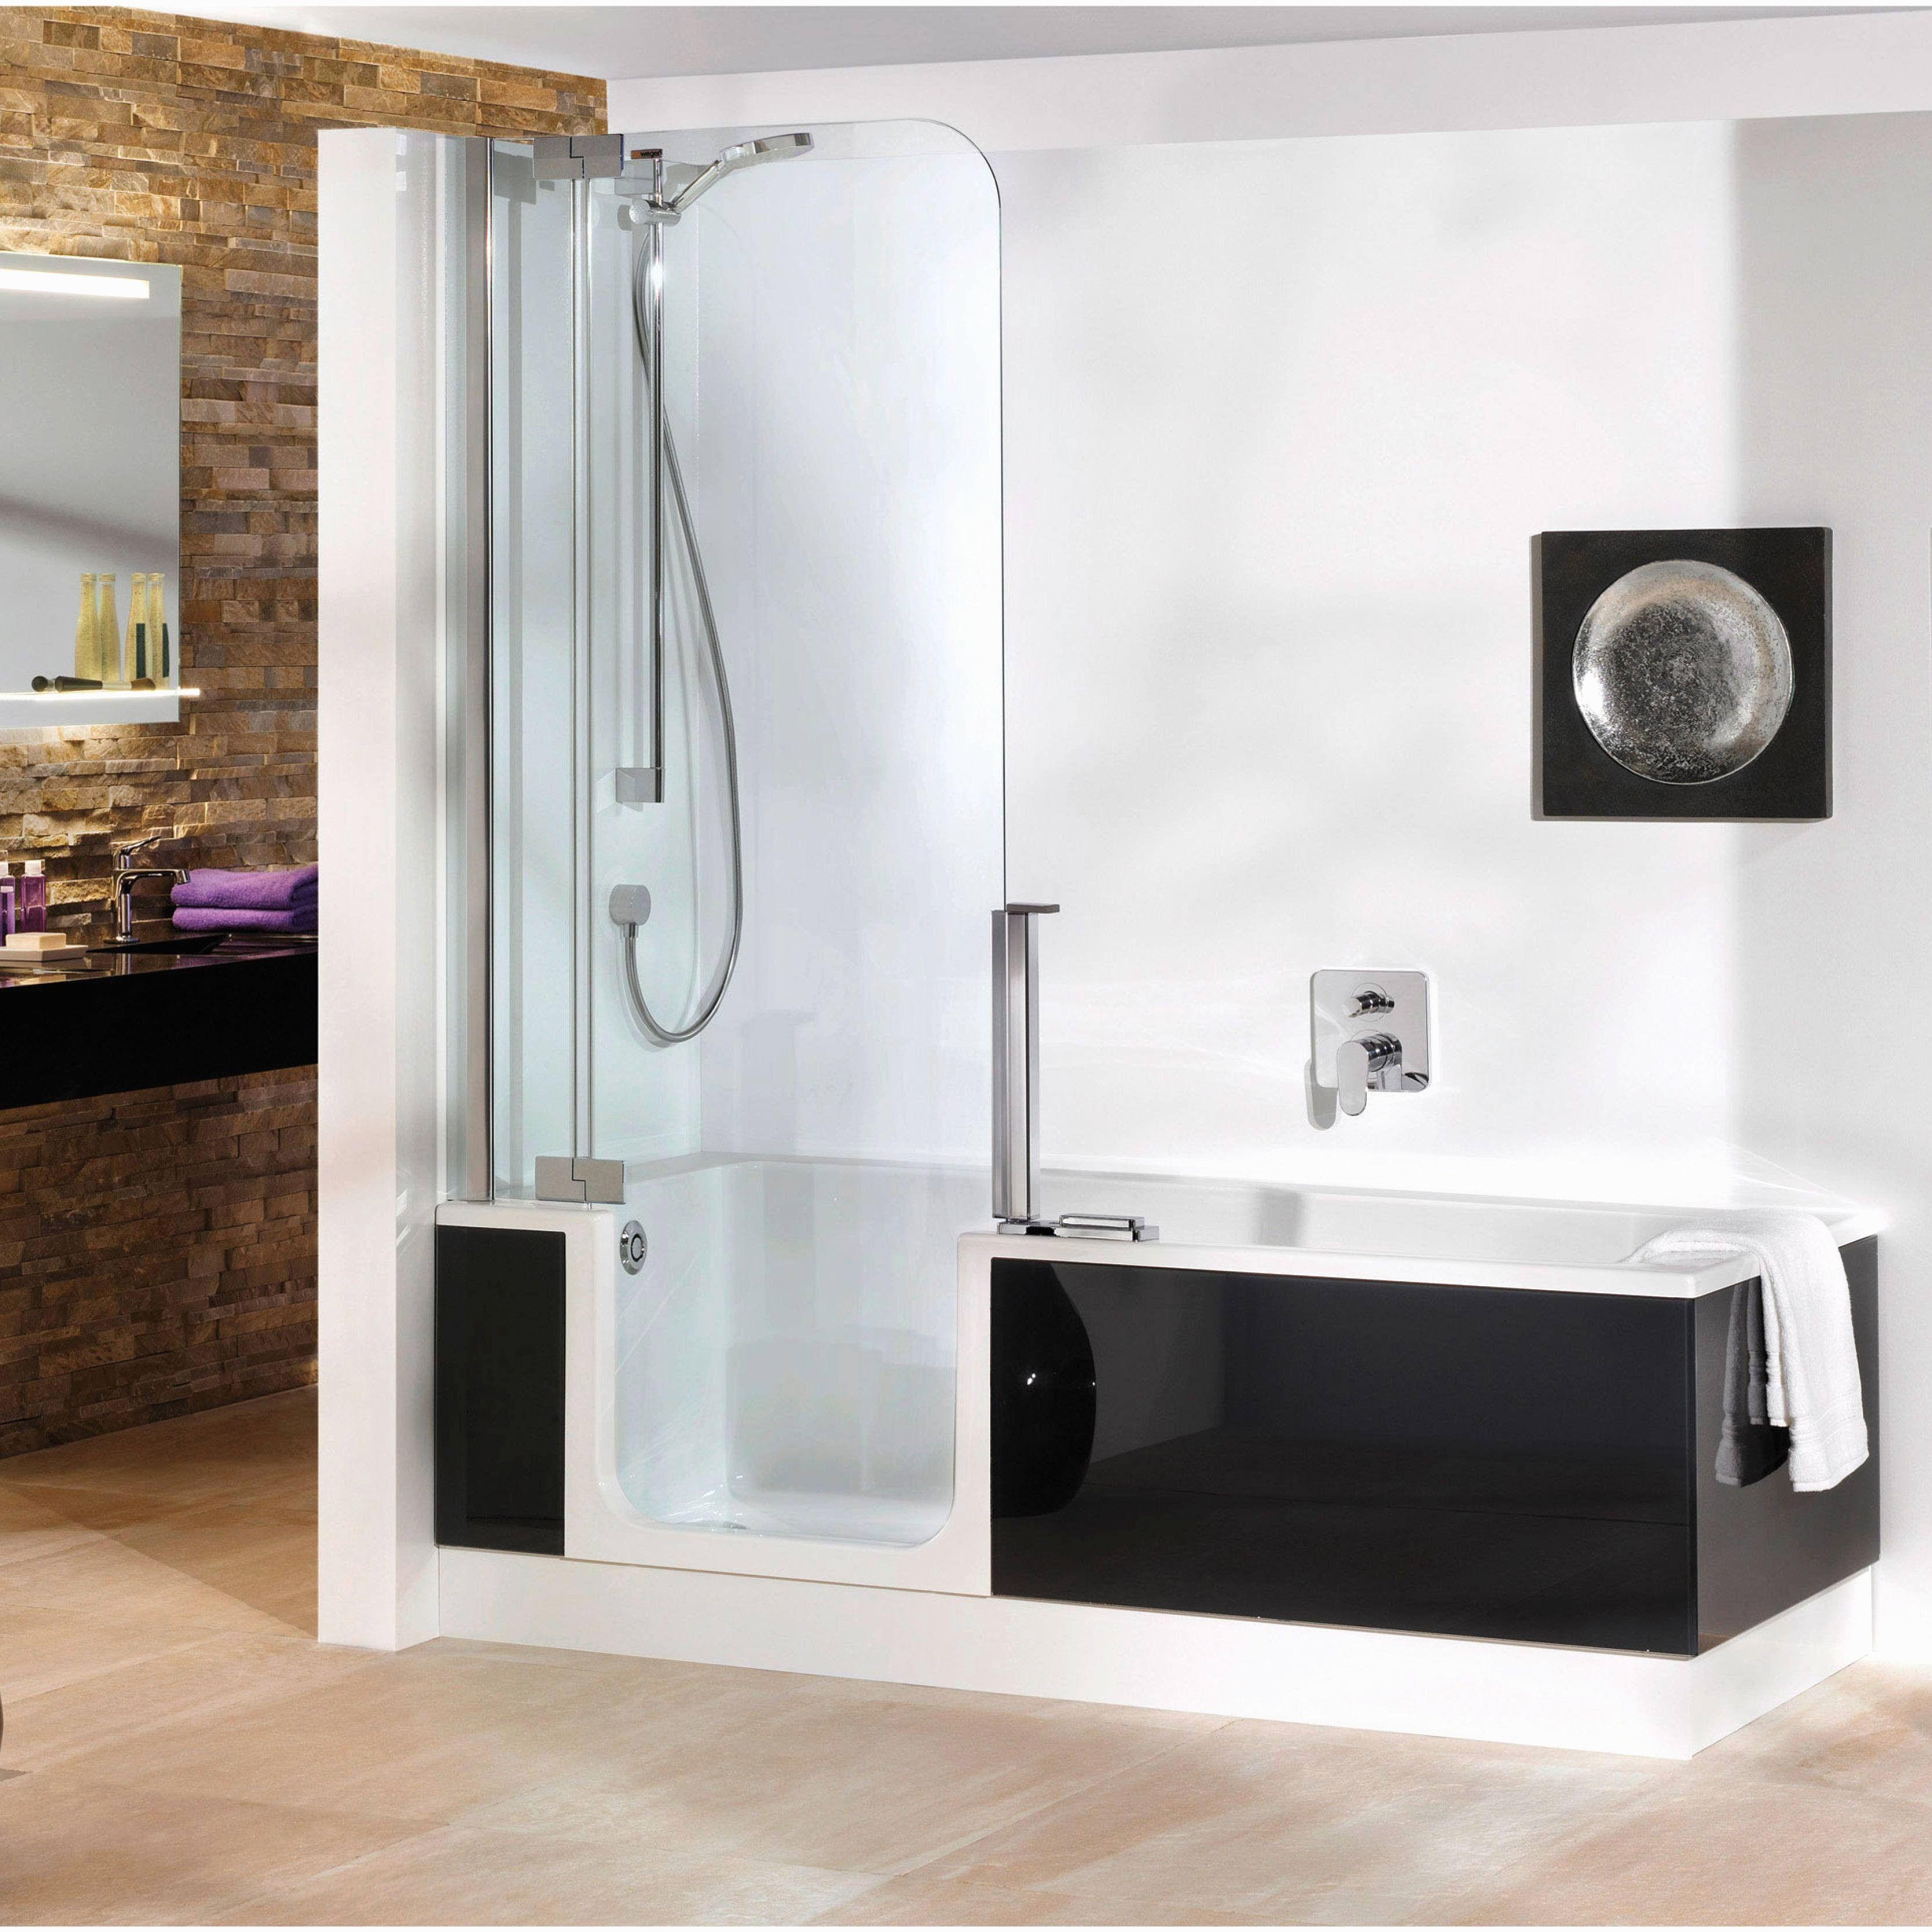 fresh duo kinedo baignoire prix  shower bath bathrooms